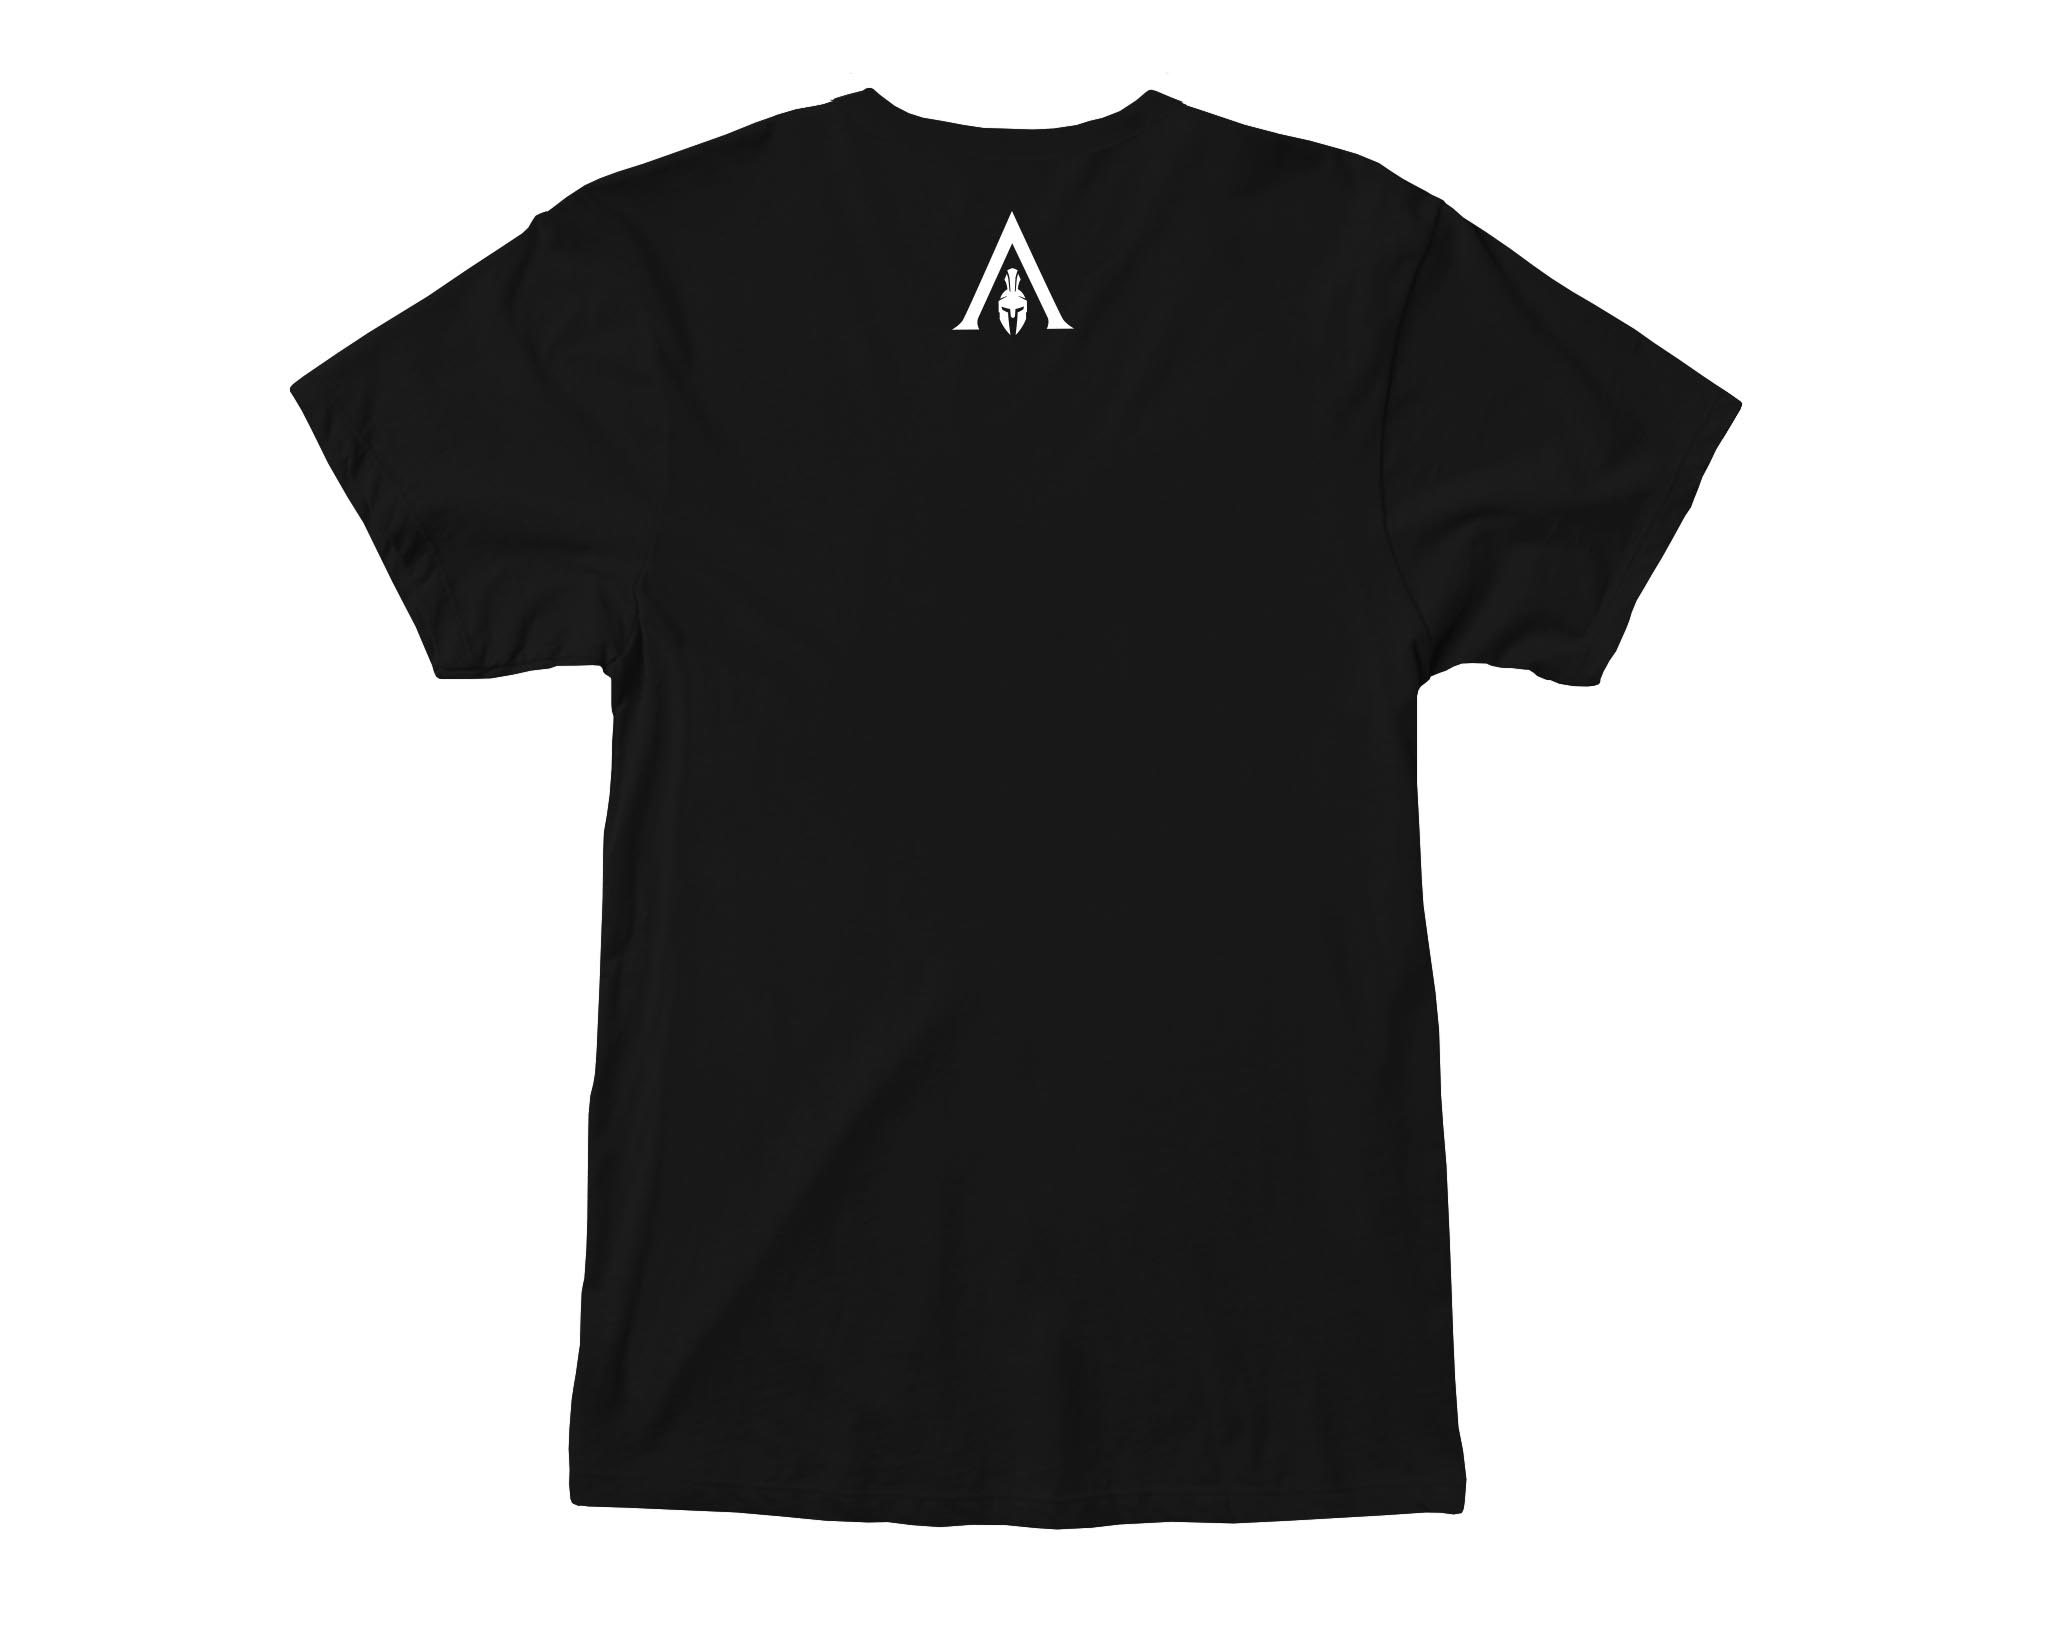 spartan maglietta  Assassin's Creed Odyssey   Spartan T-shirt   Ubisoft Store